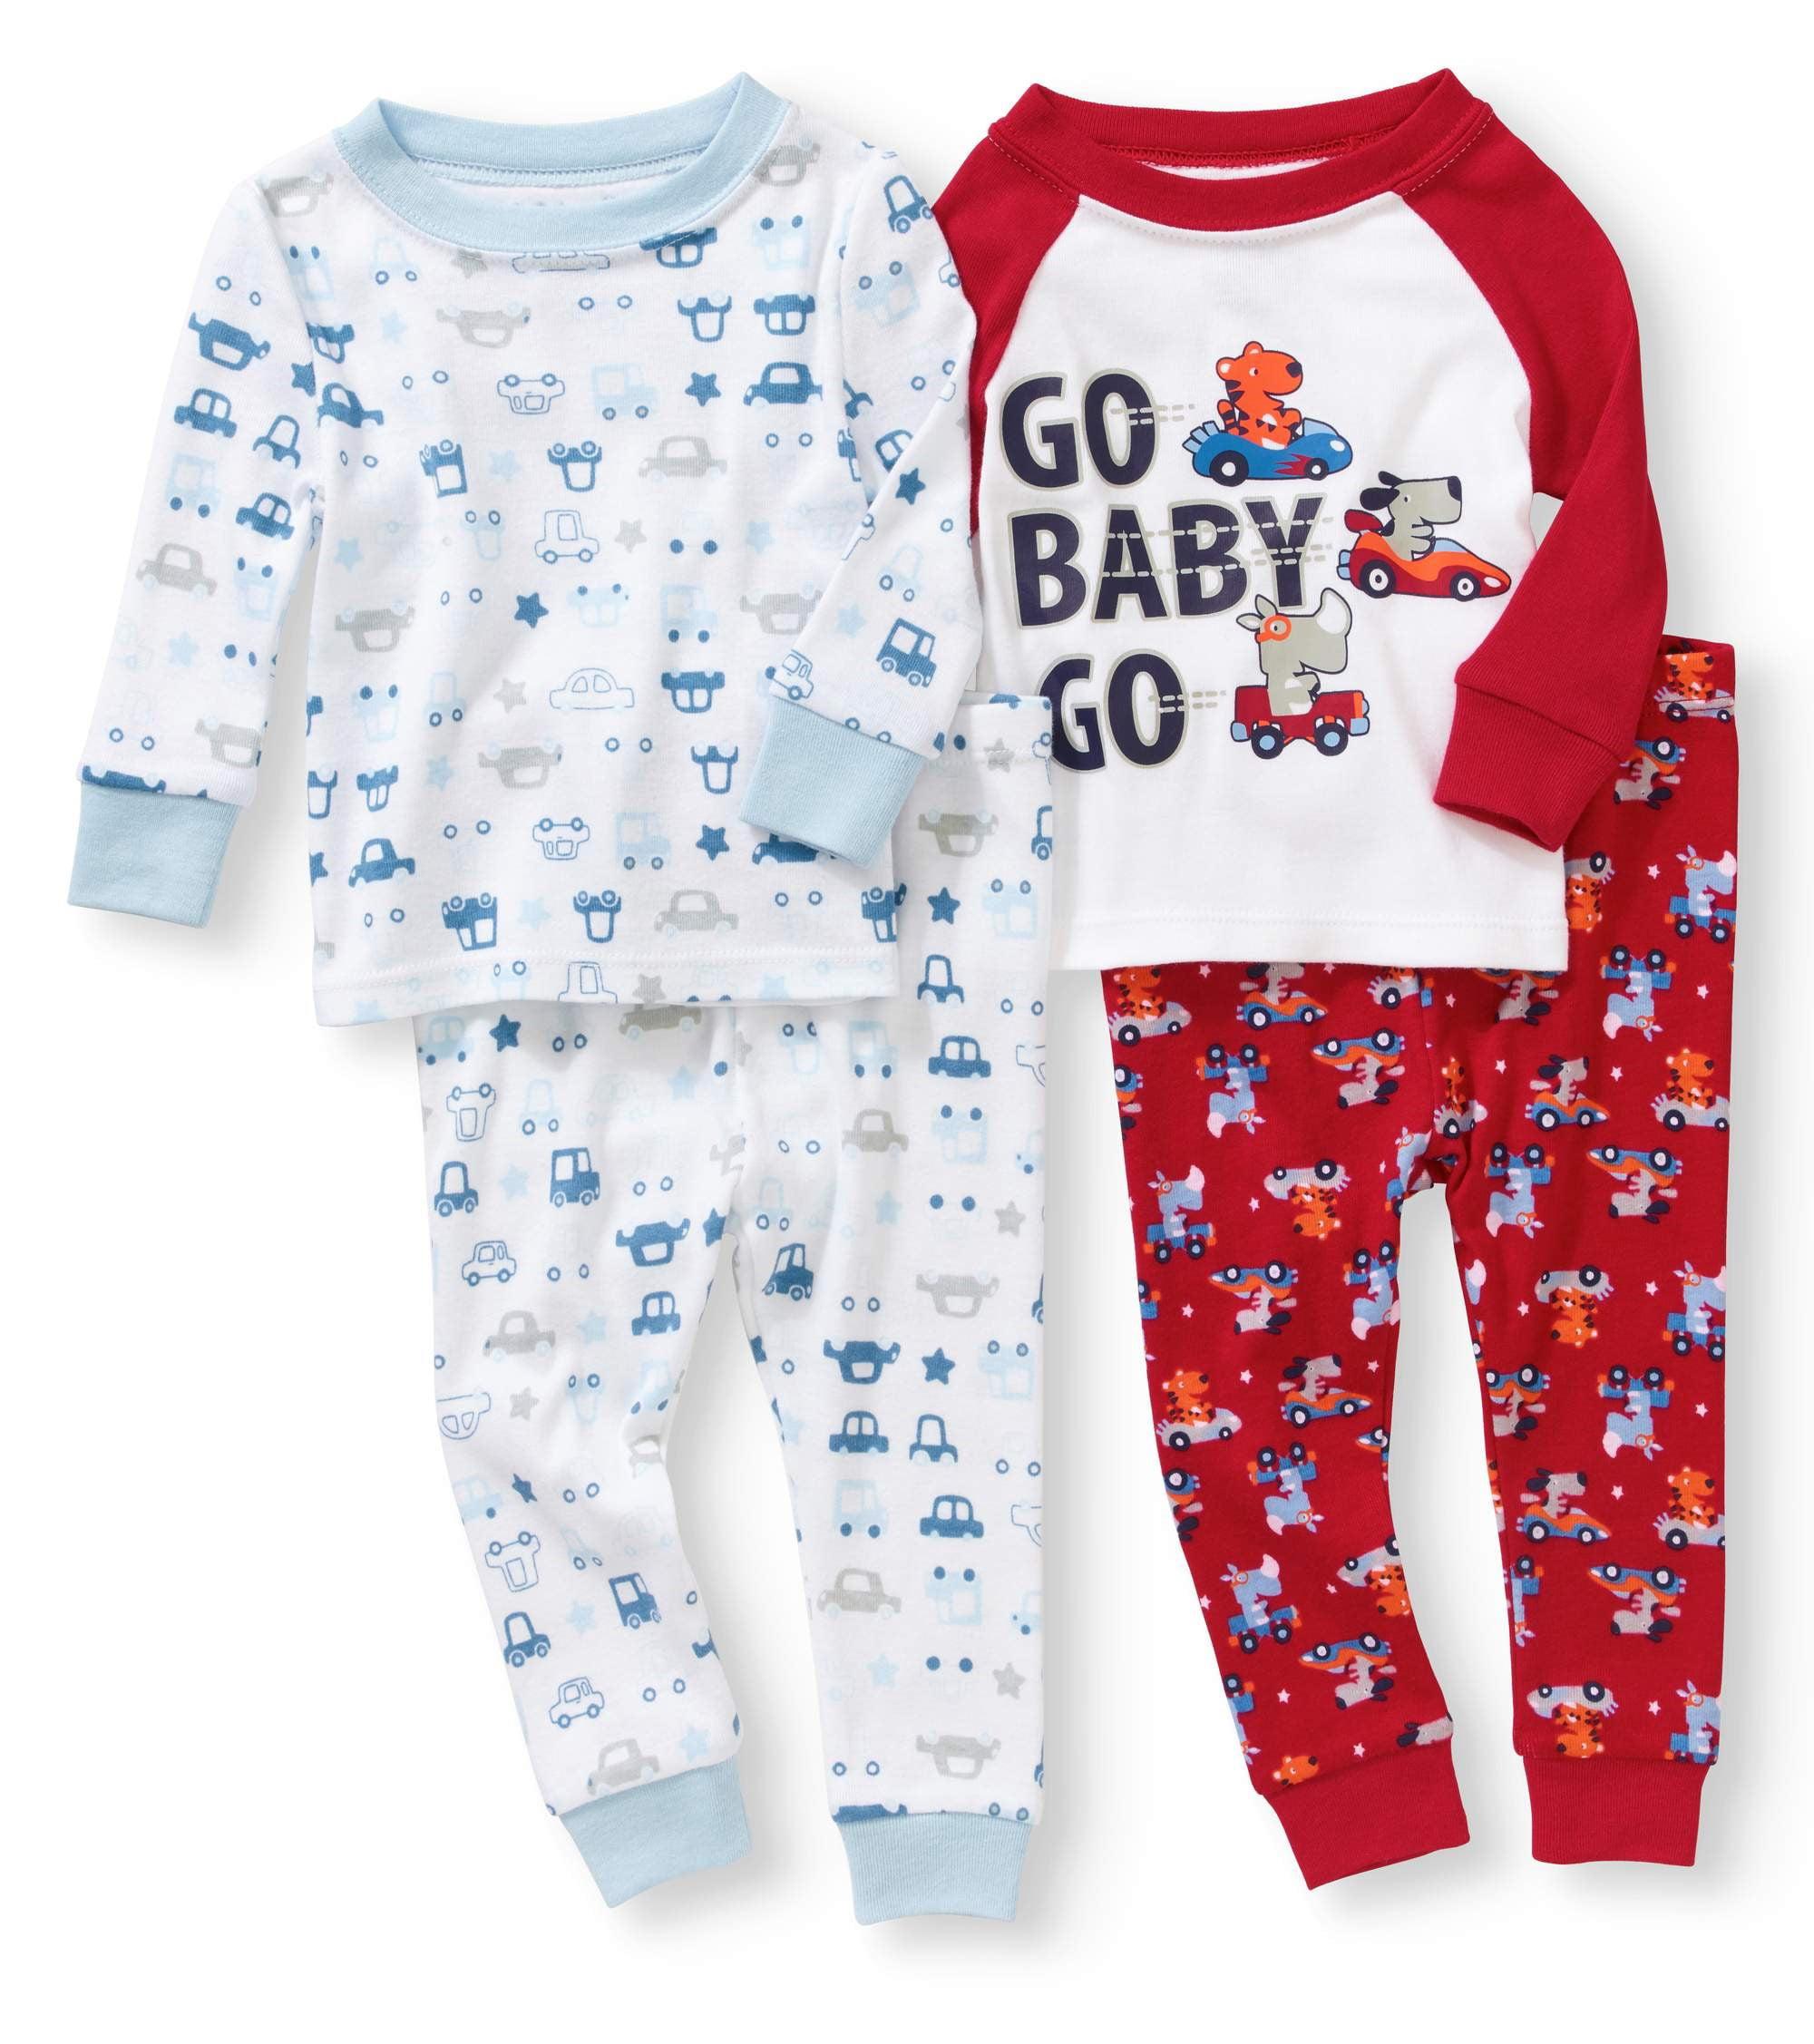 Baby Boy Tight Fit Cotton Pajama 4pc Set - Walmart.com